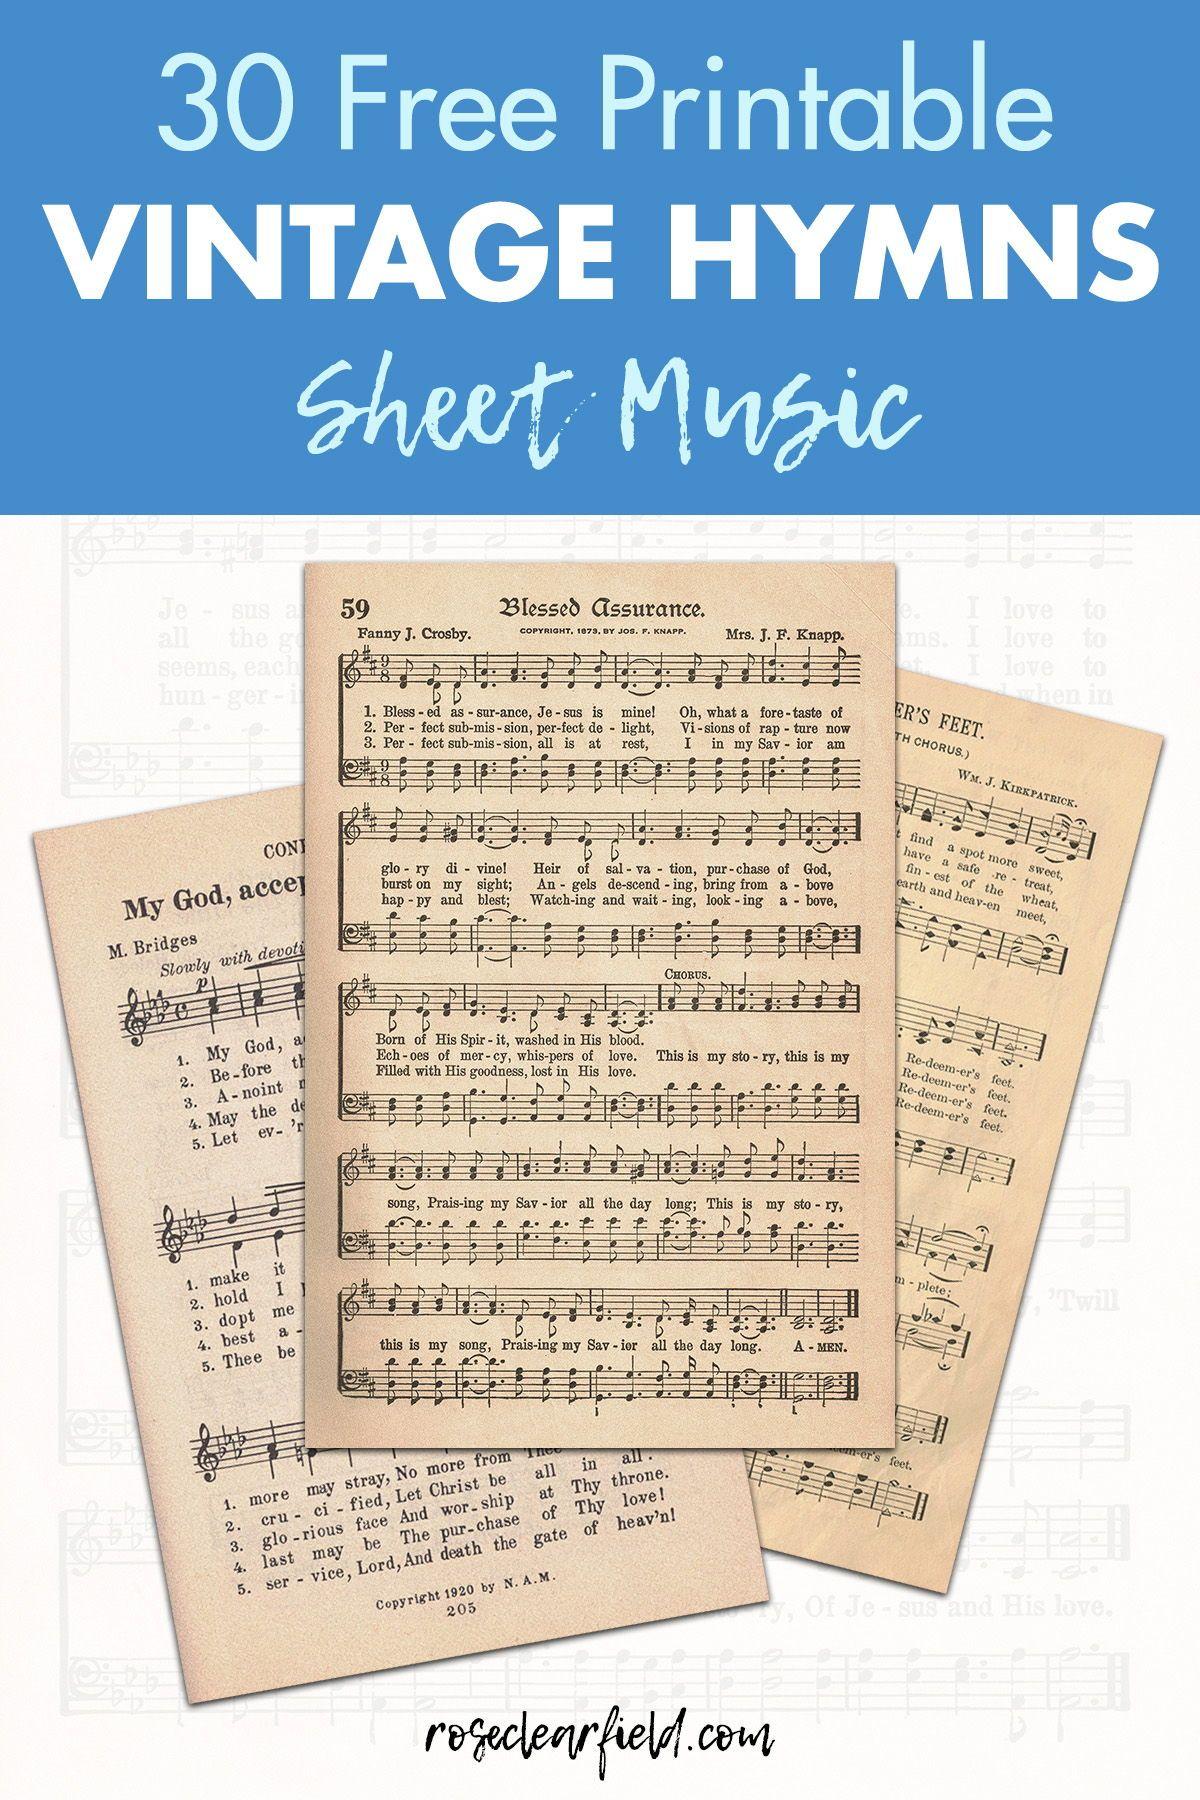 FREE Printable Vintage Hymns Sheet Music